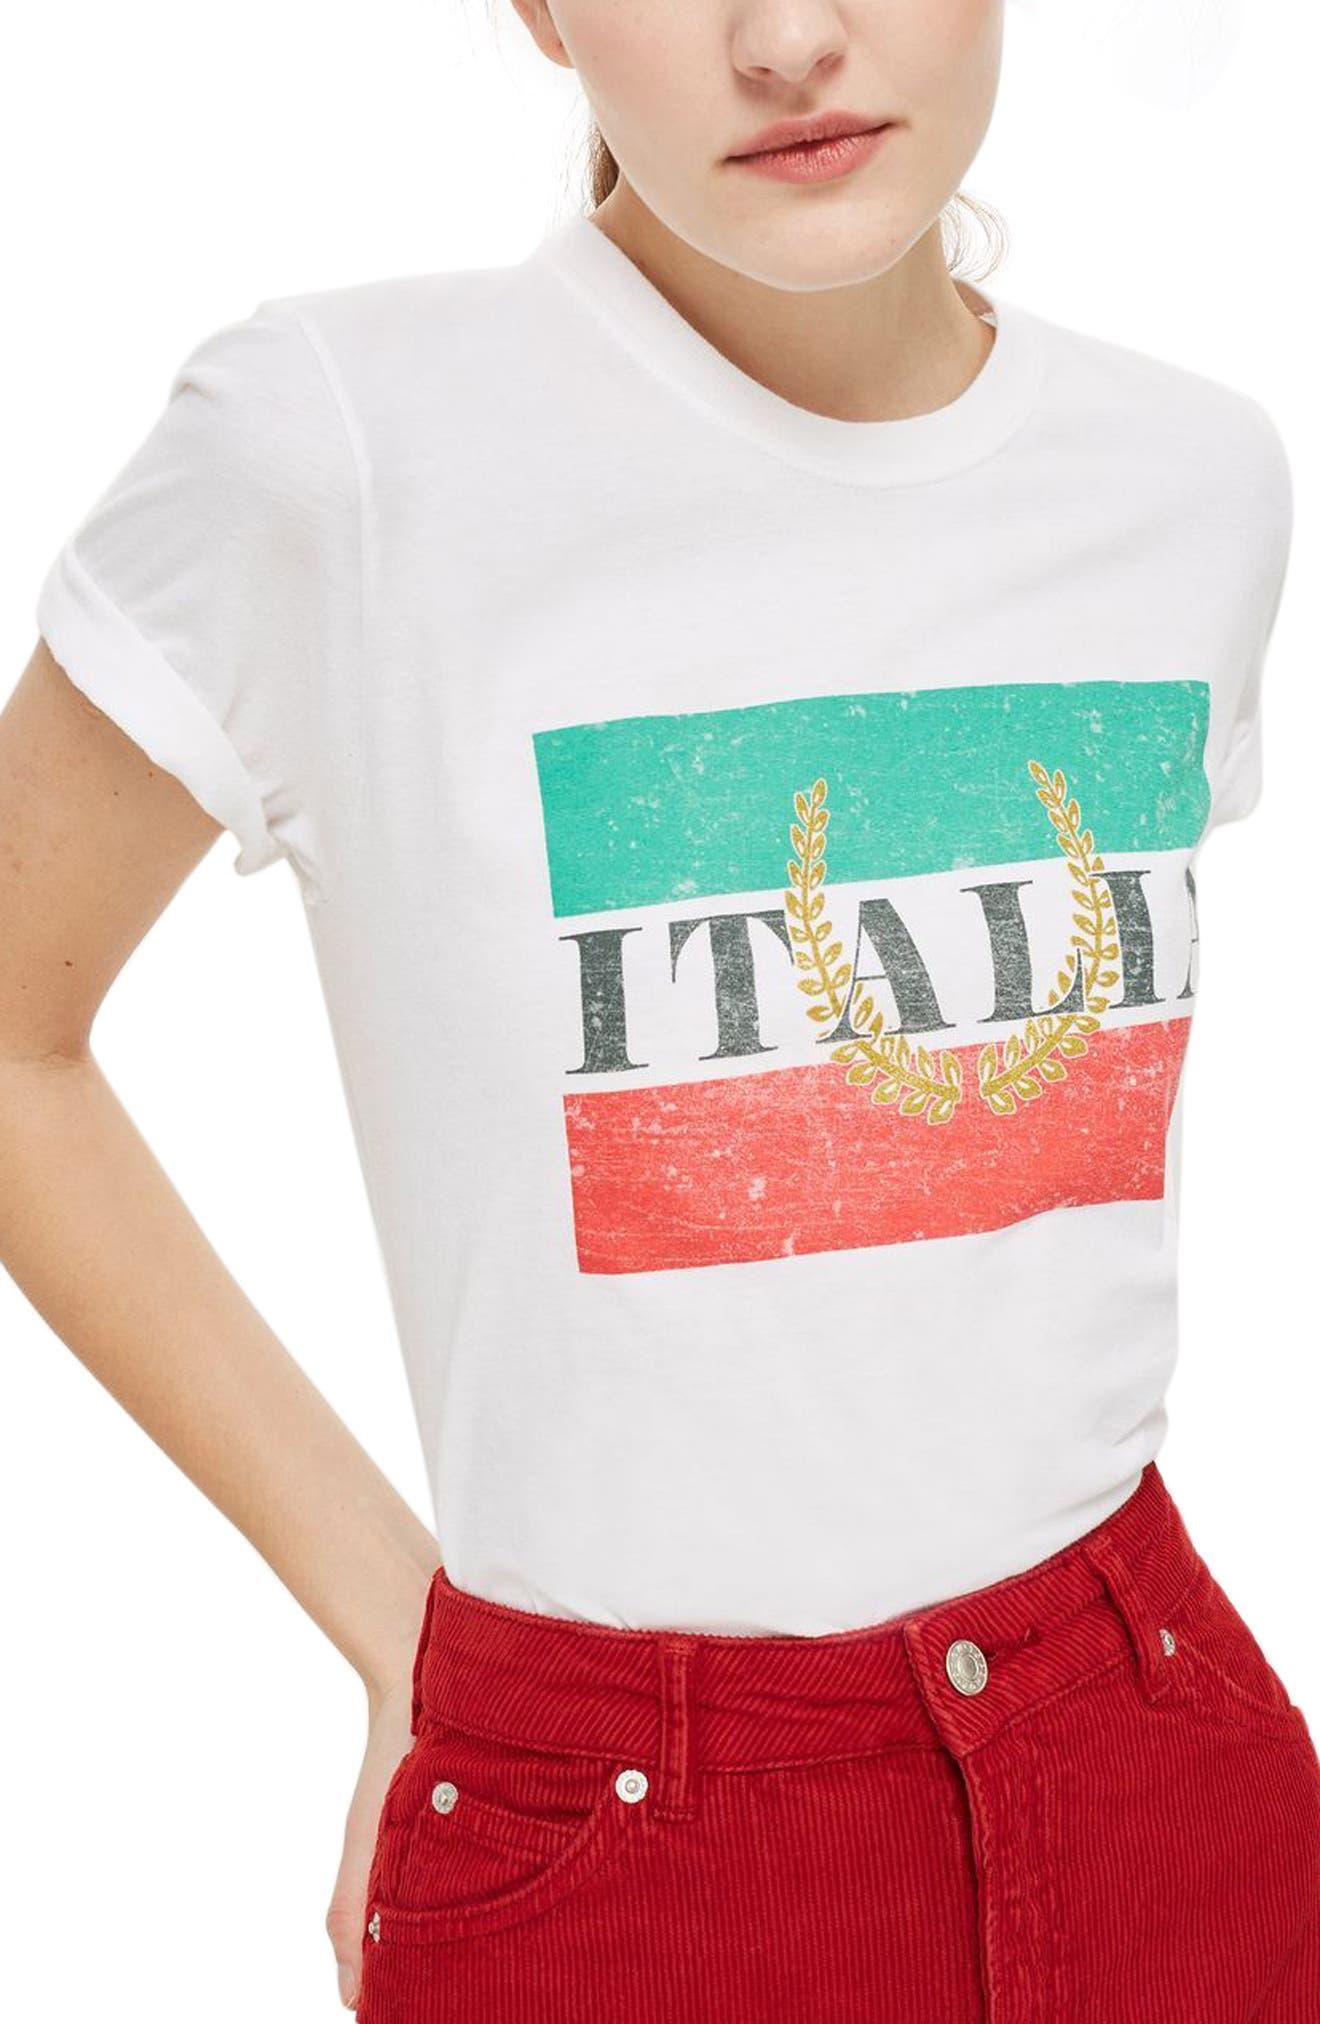 Topshop by Tee & Cake Italia Graphic Tee